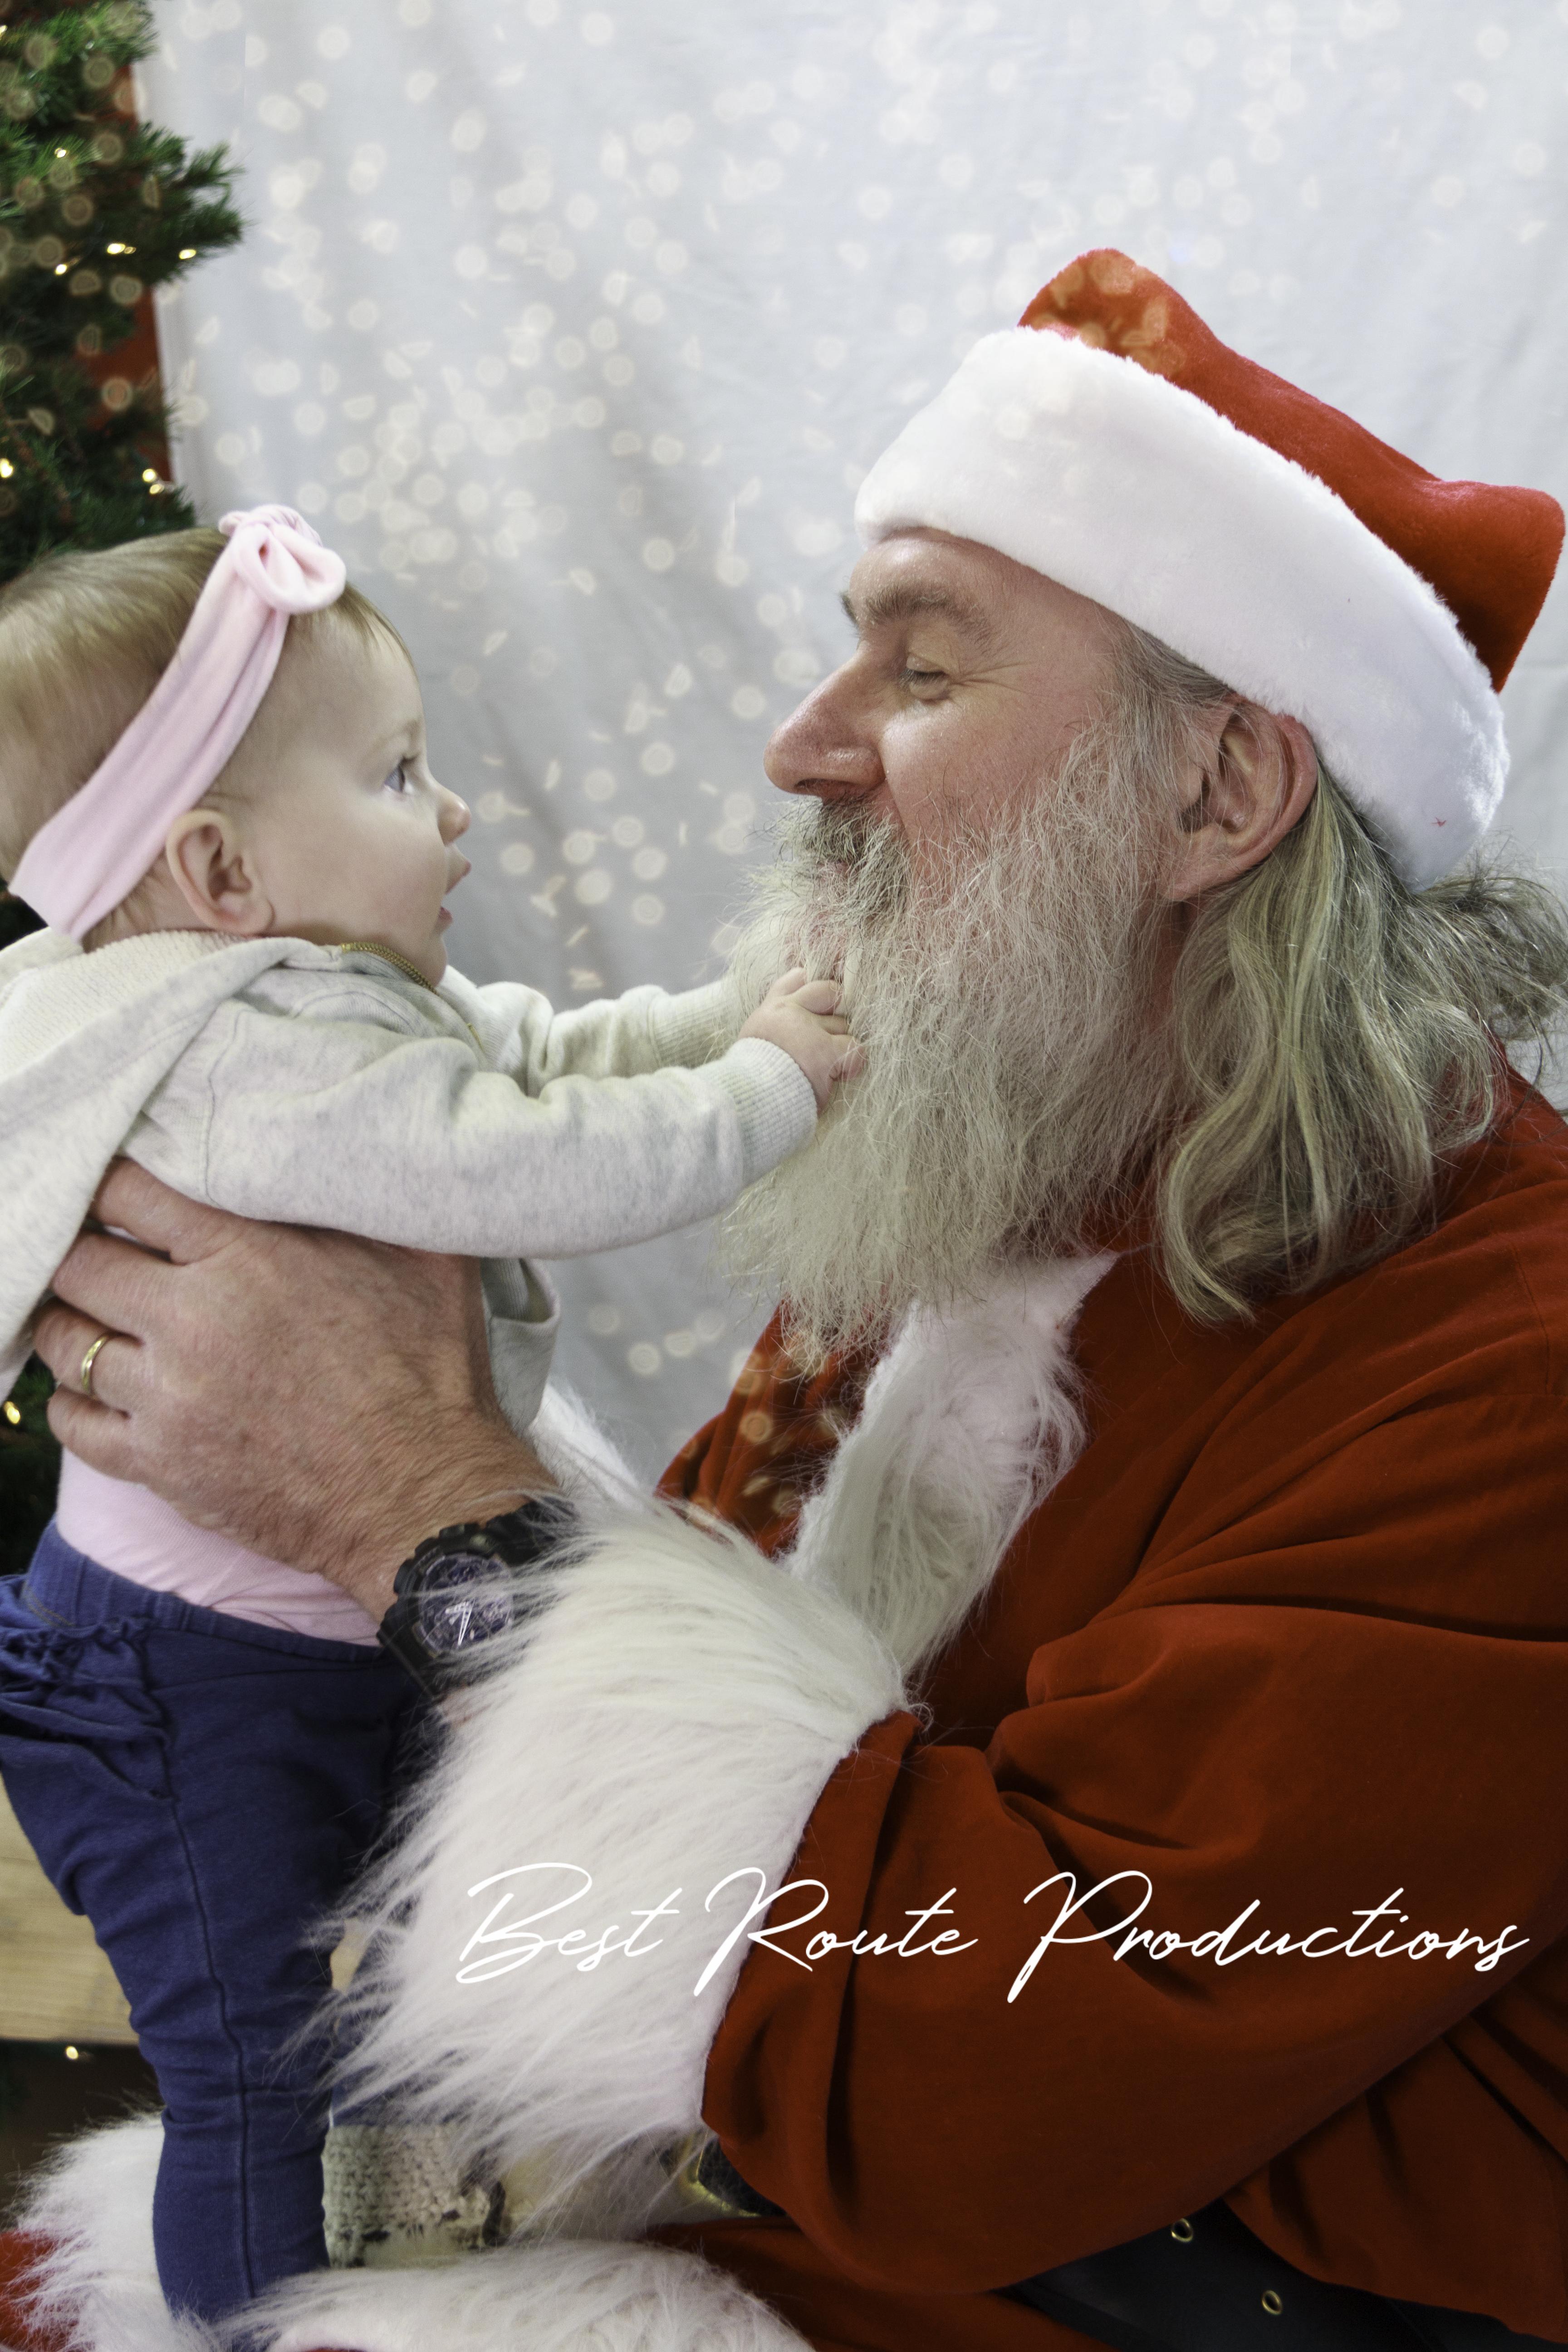 BestRoute_Santa_Web-14